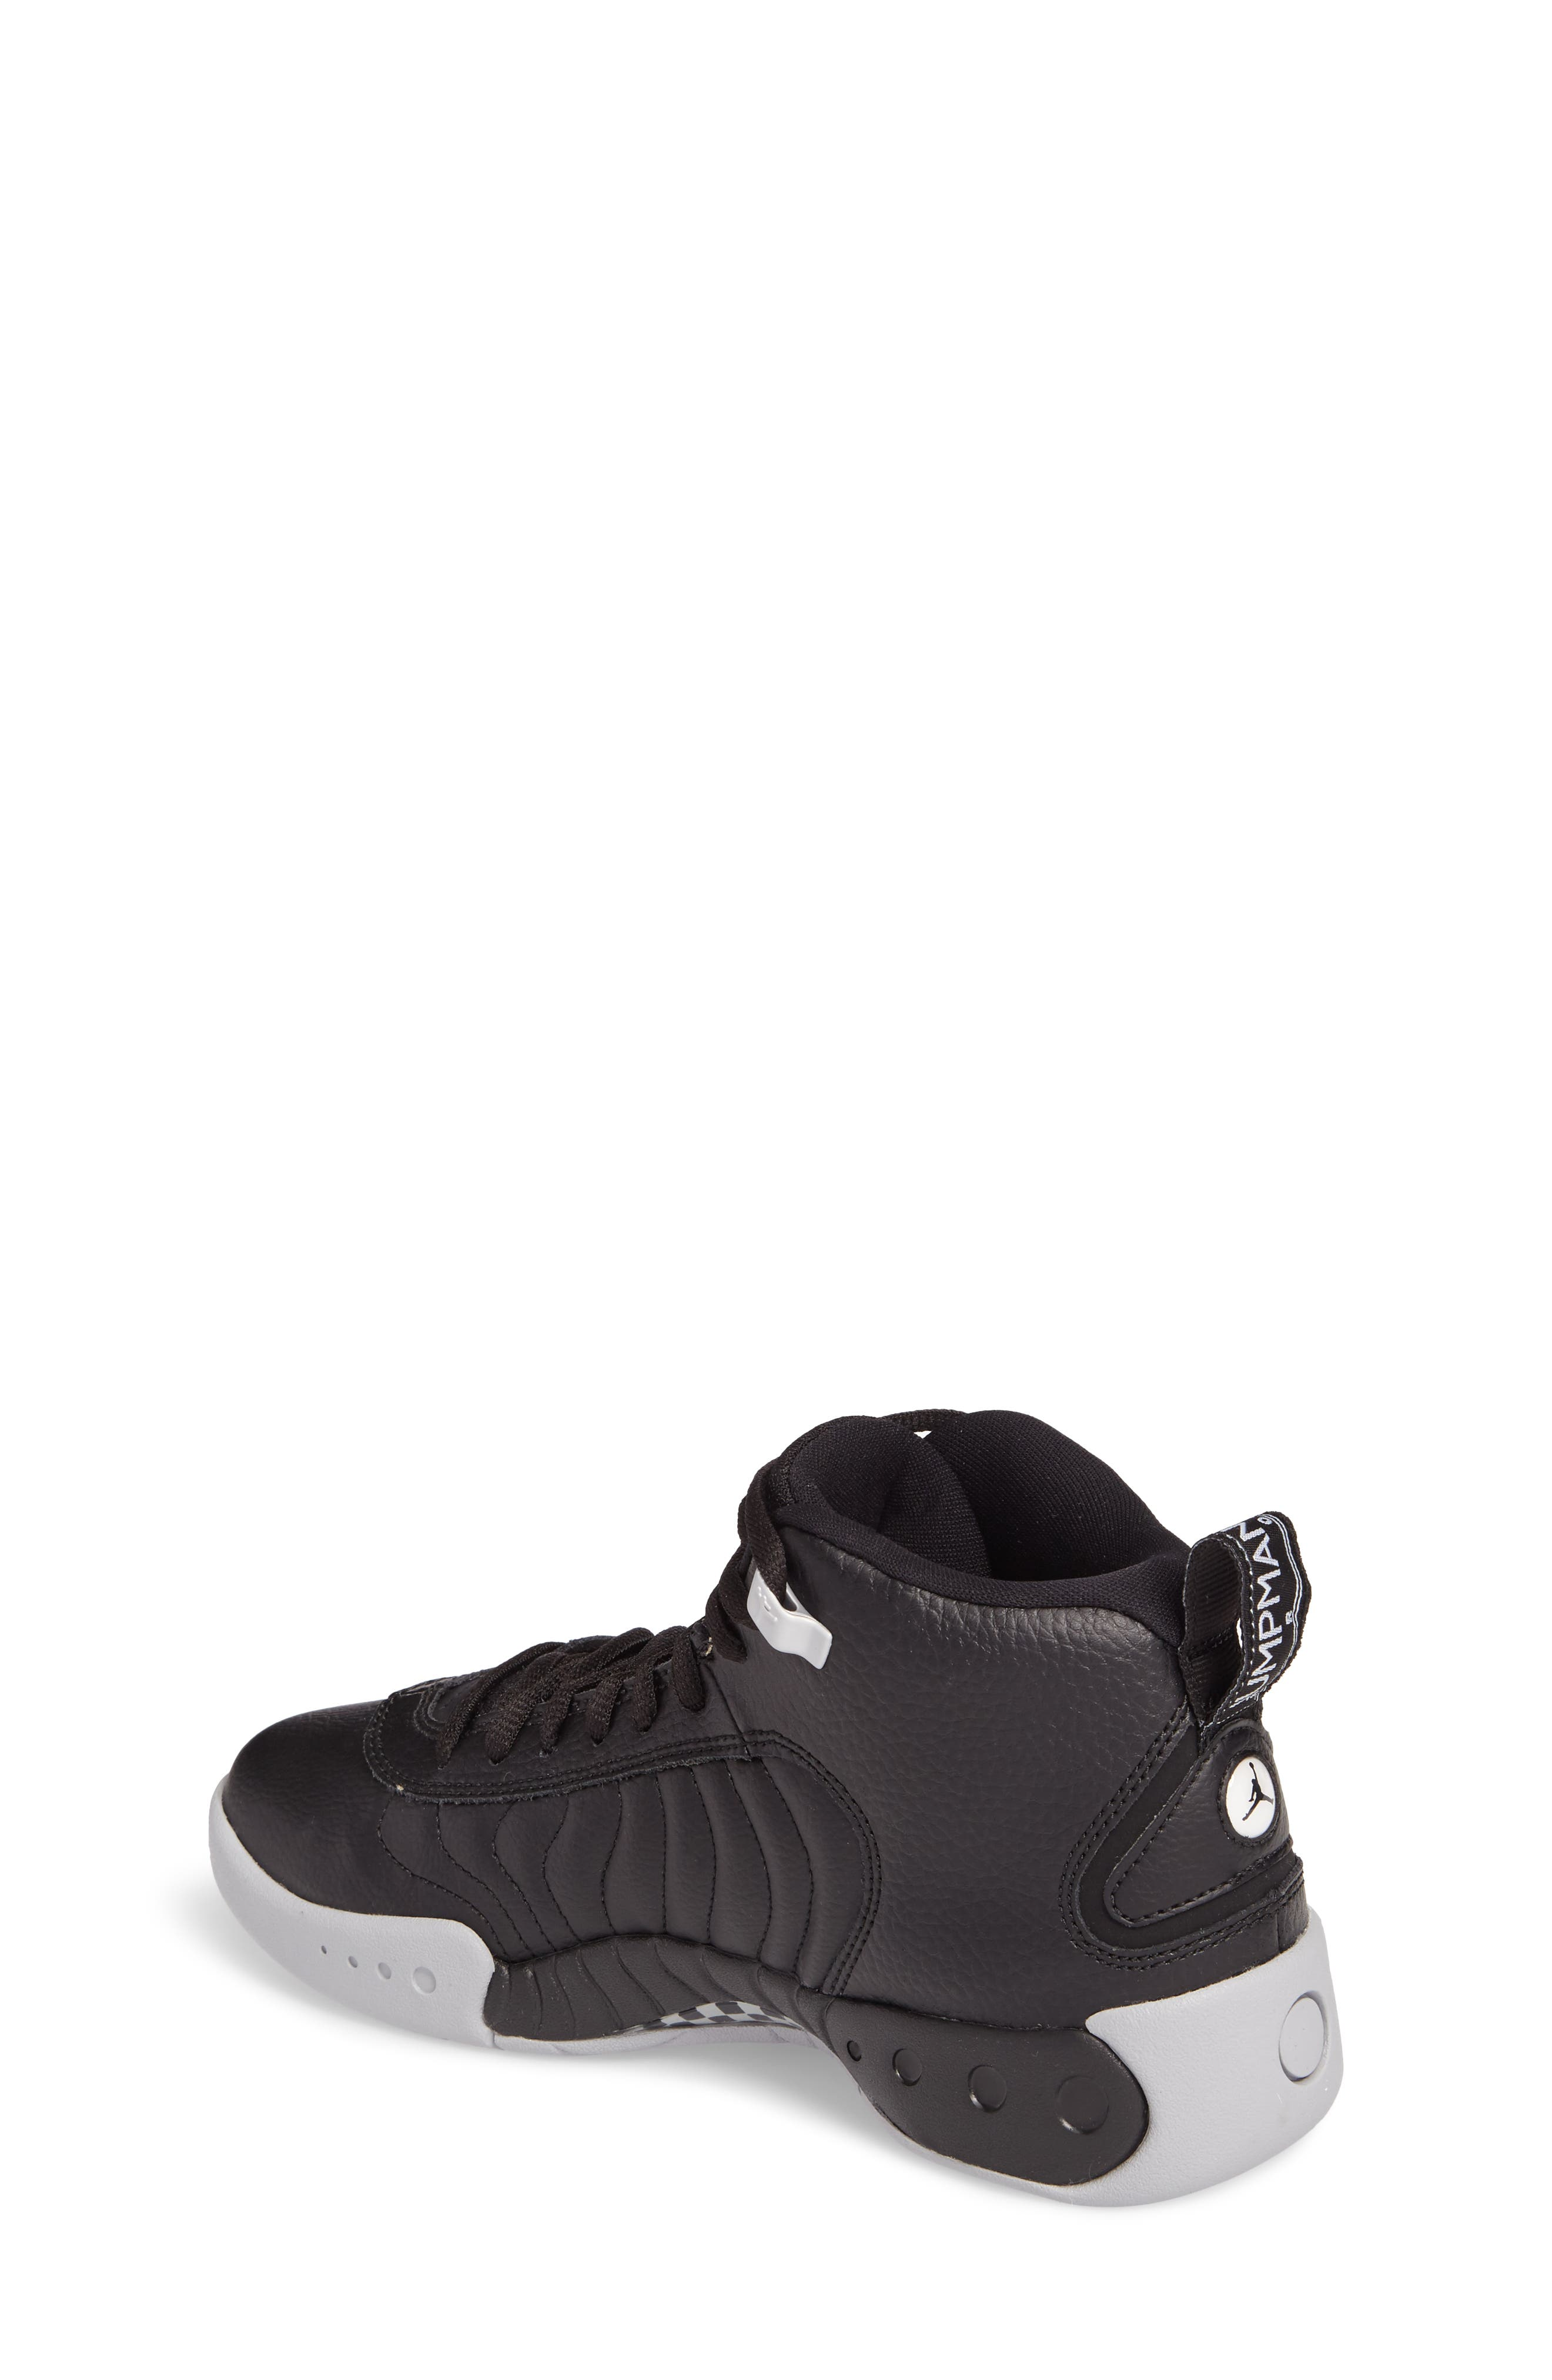 Jumpman Pro BG Mid Top Sneaker,                             Alternate thumbnail 2, color,                             Black/ White-Wolf Grey